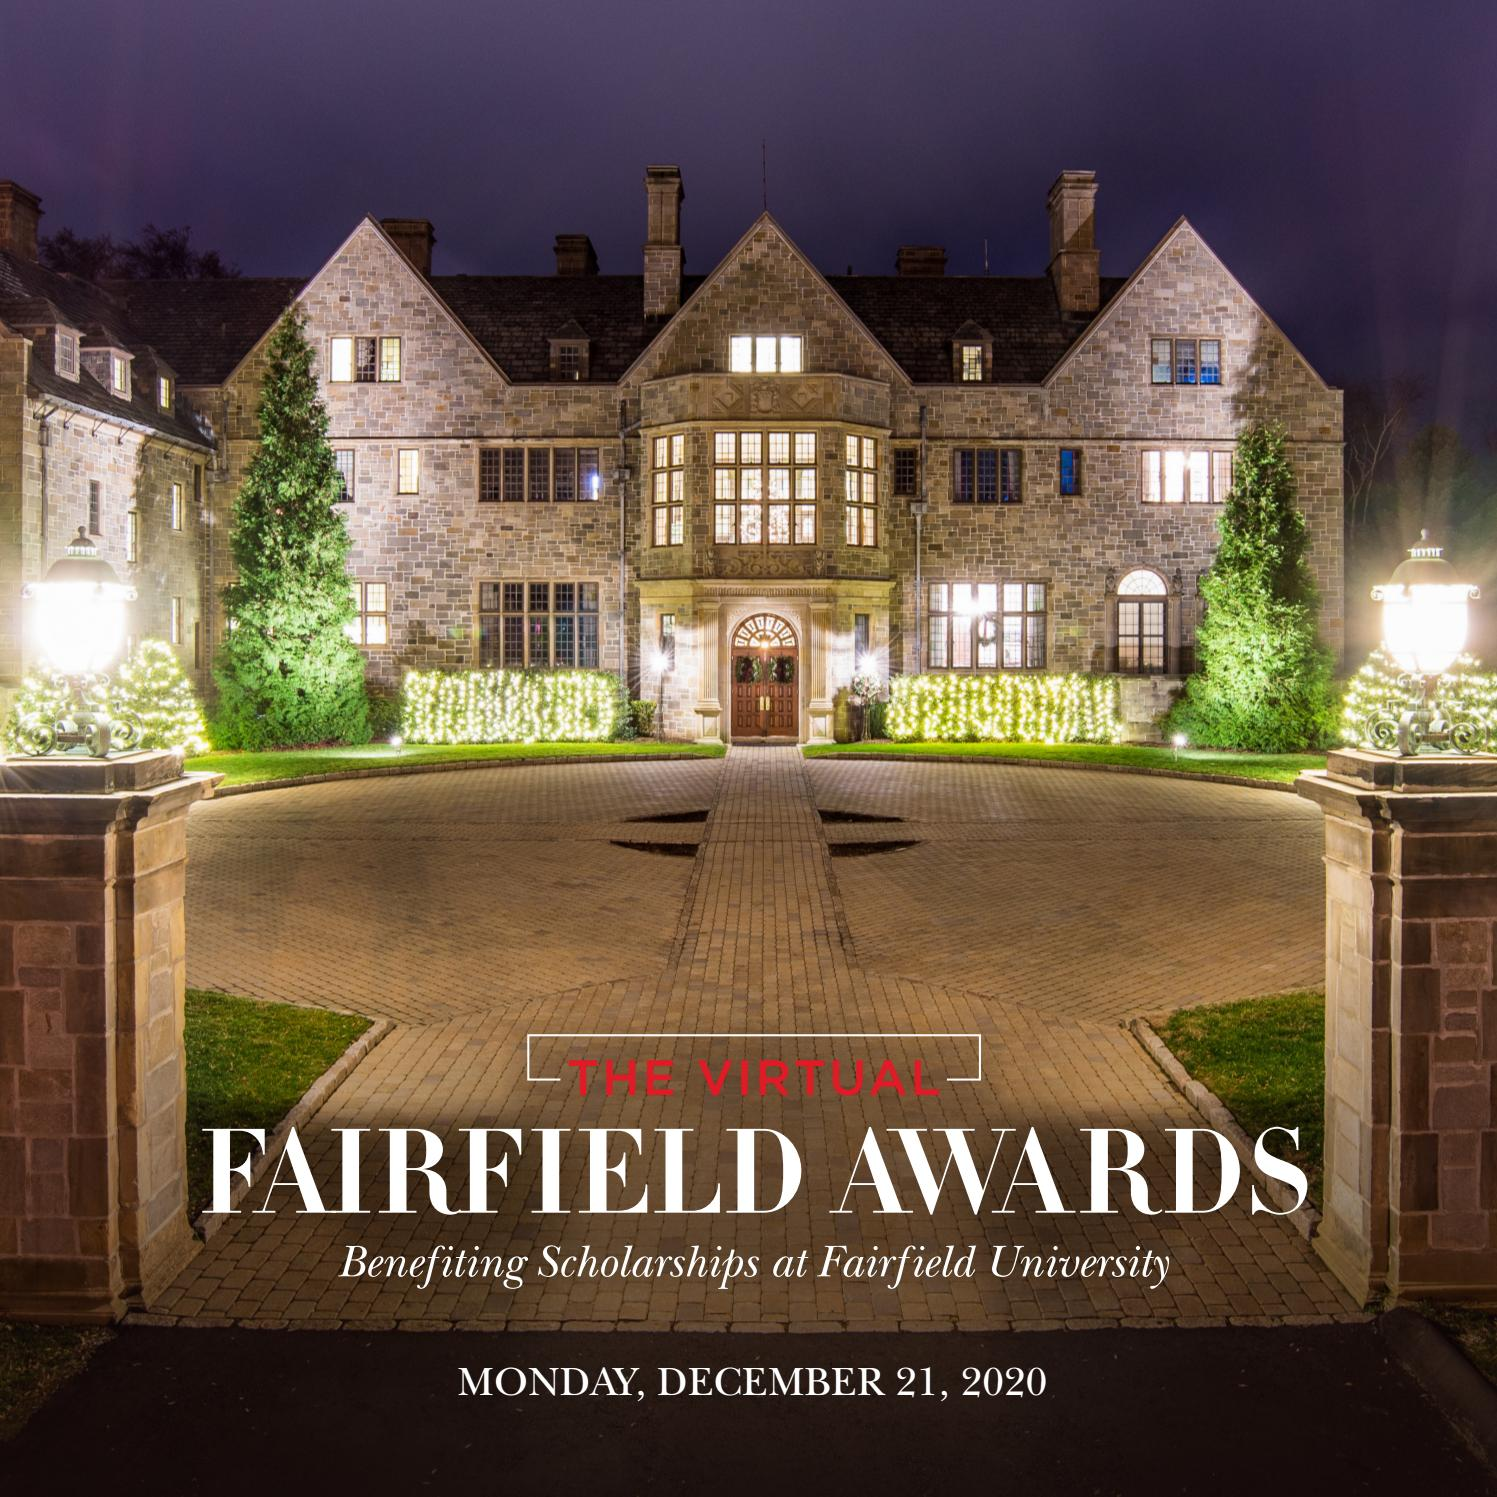 The Virtual Fairfield Awards 2020 By Fairfield University Issuu